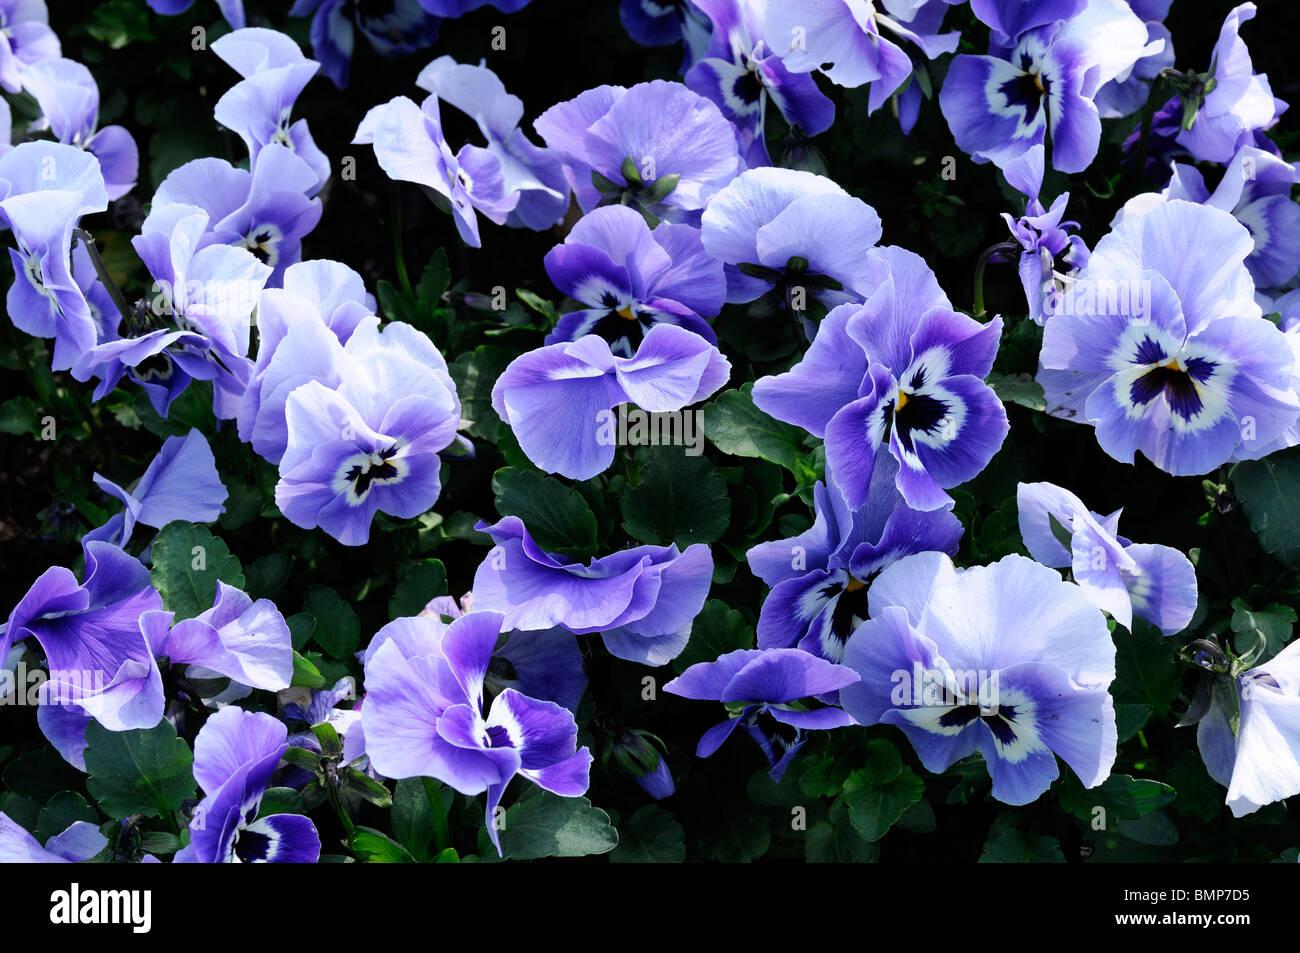 Viola wittrockiana pansy joker light blue flower - Stock Image